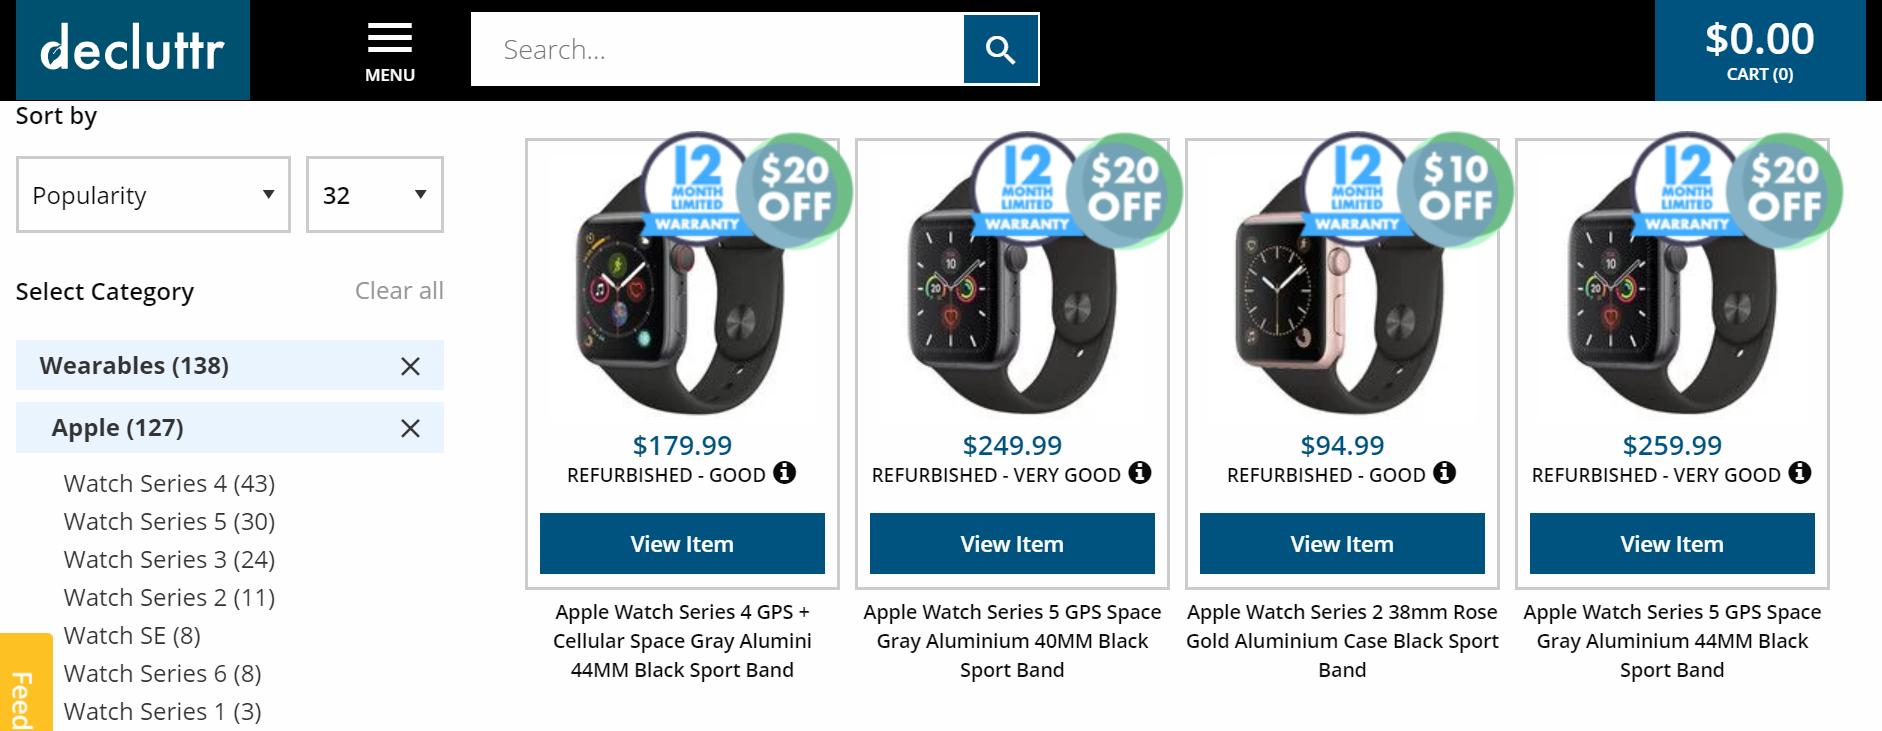 Screenshot of refurbished Apple watch series 2, 3, 4 and refurbished Apple watch series 5 product page of Declutter